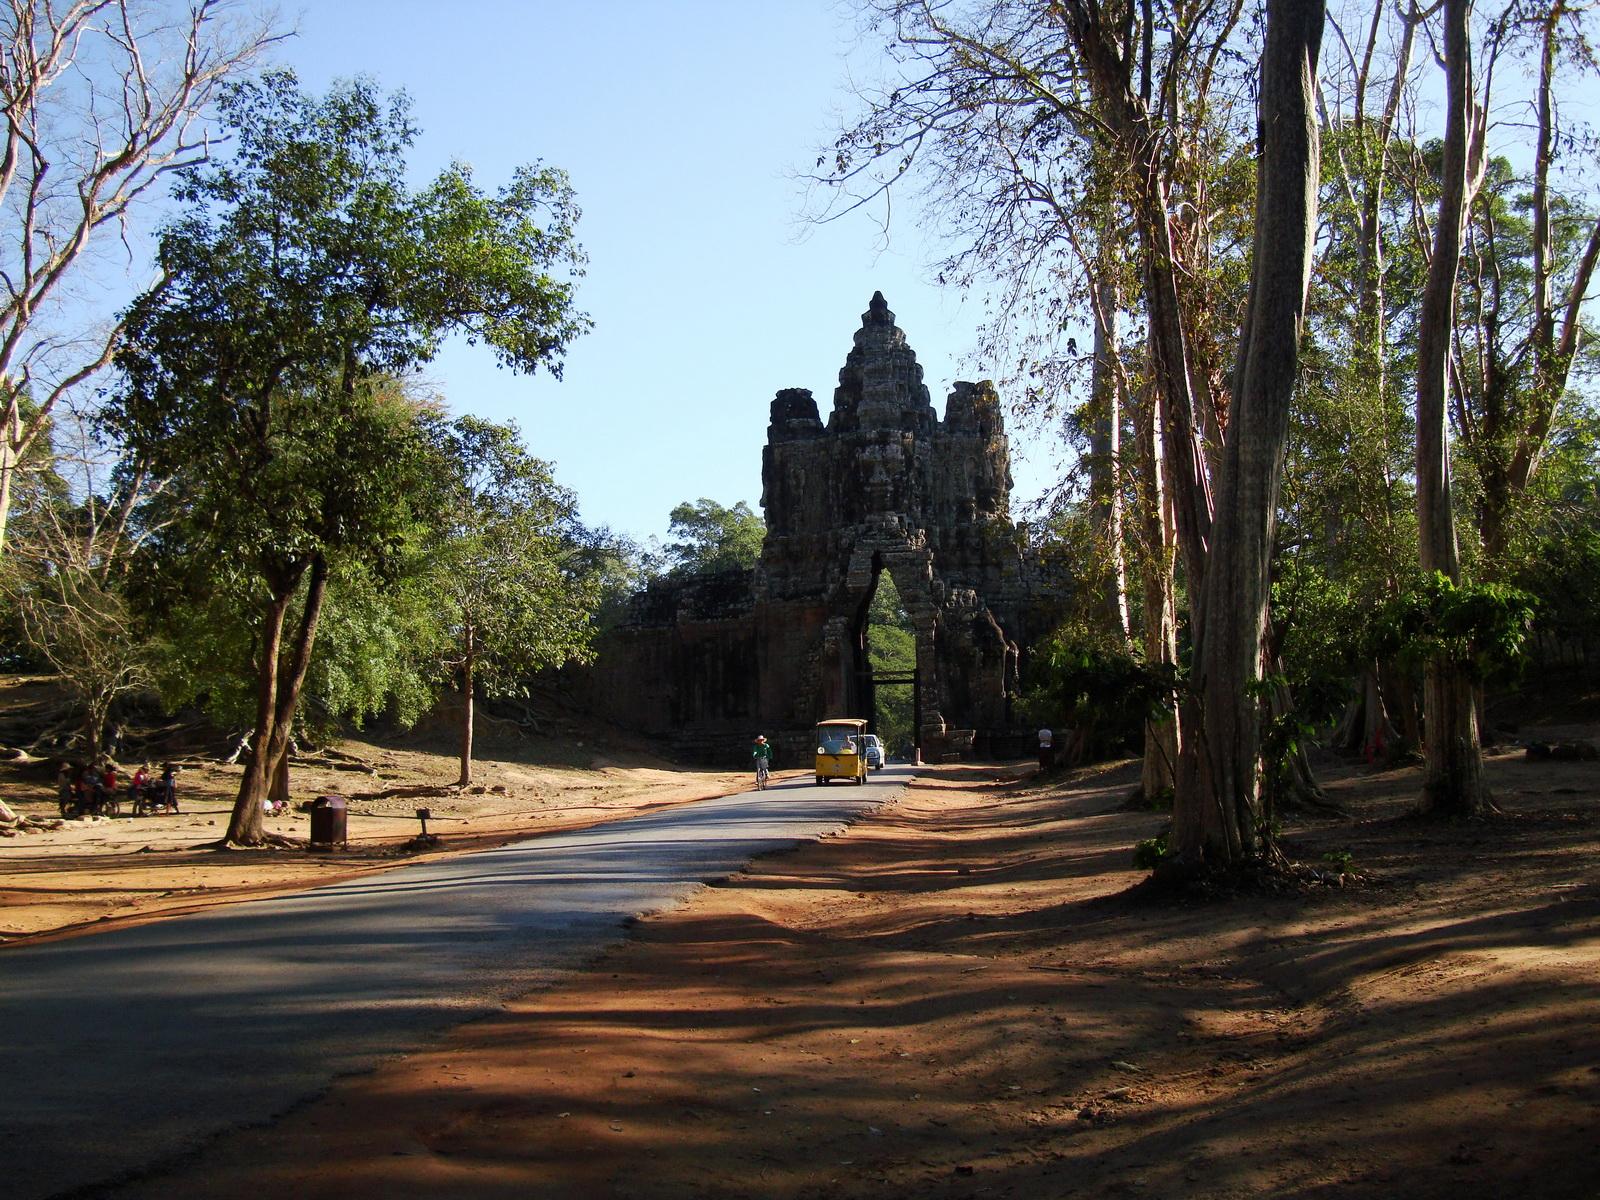 Face tower of the South Gate showing Avalokiteshvara Jan 2010 13